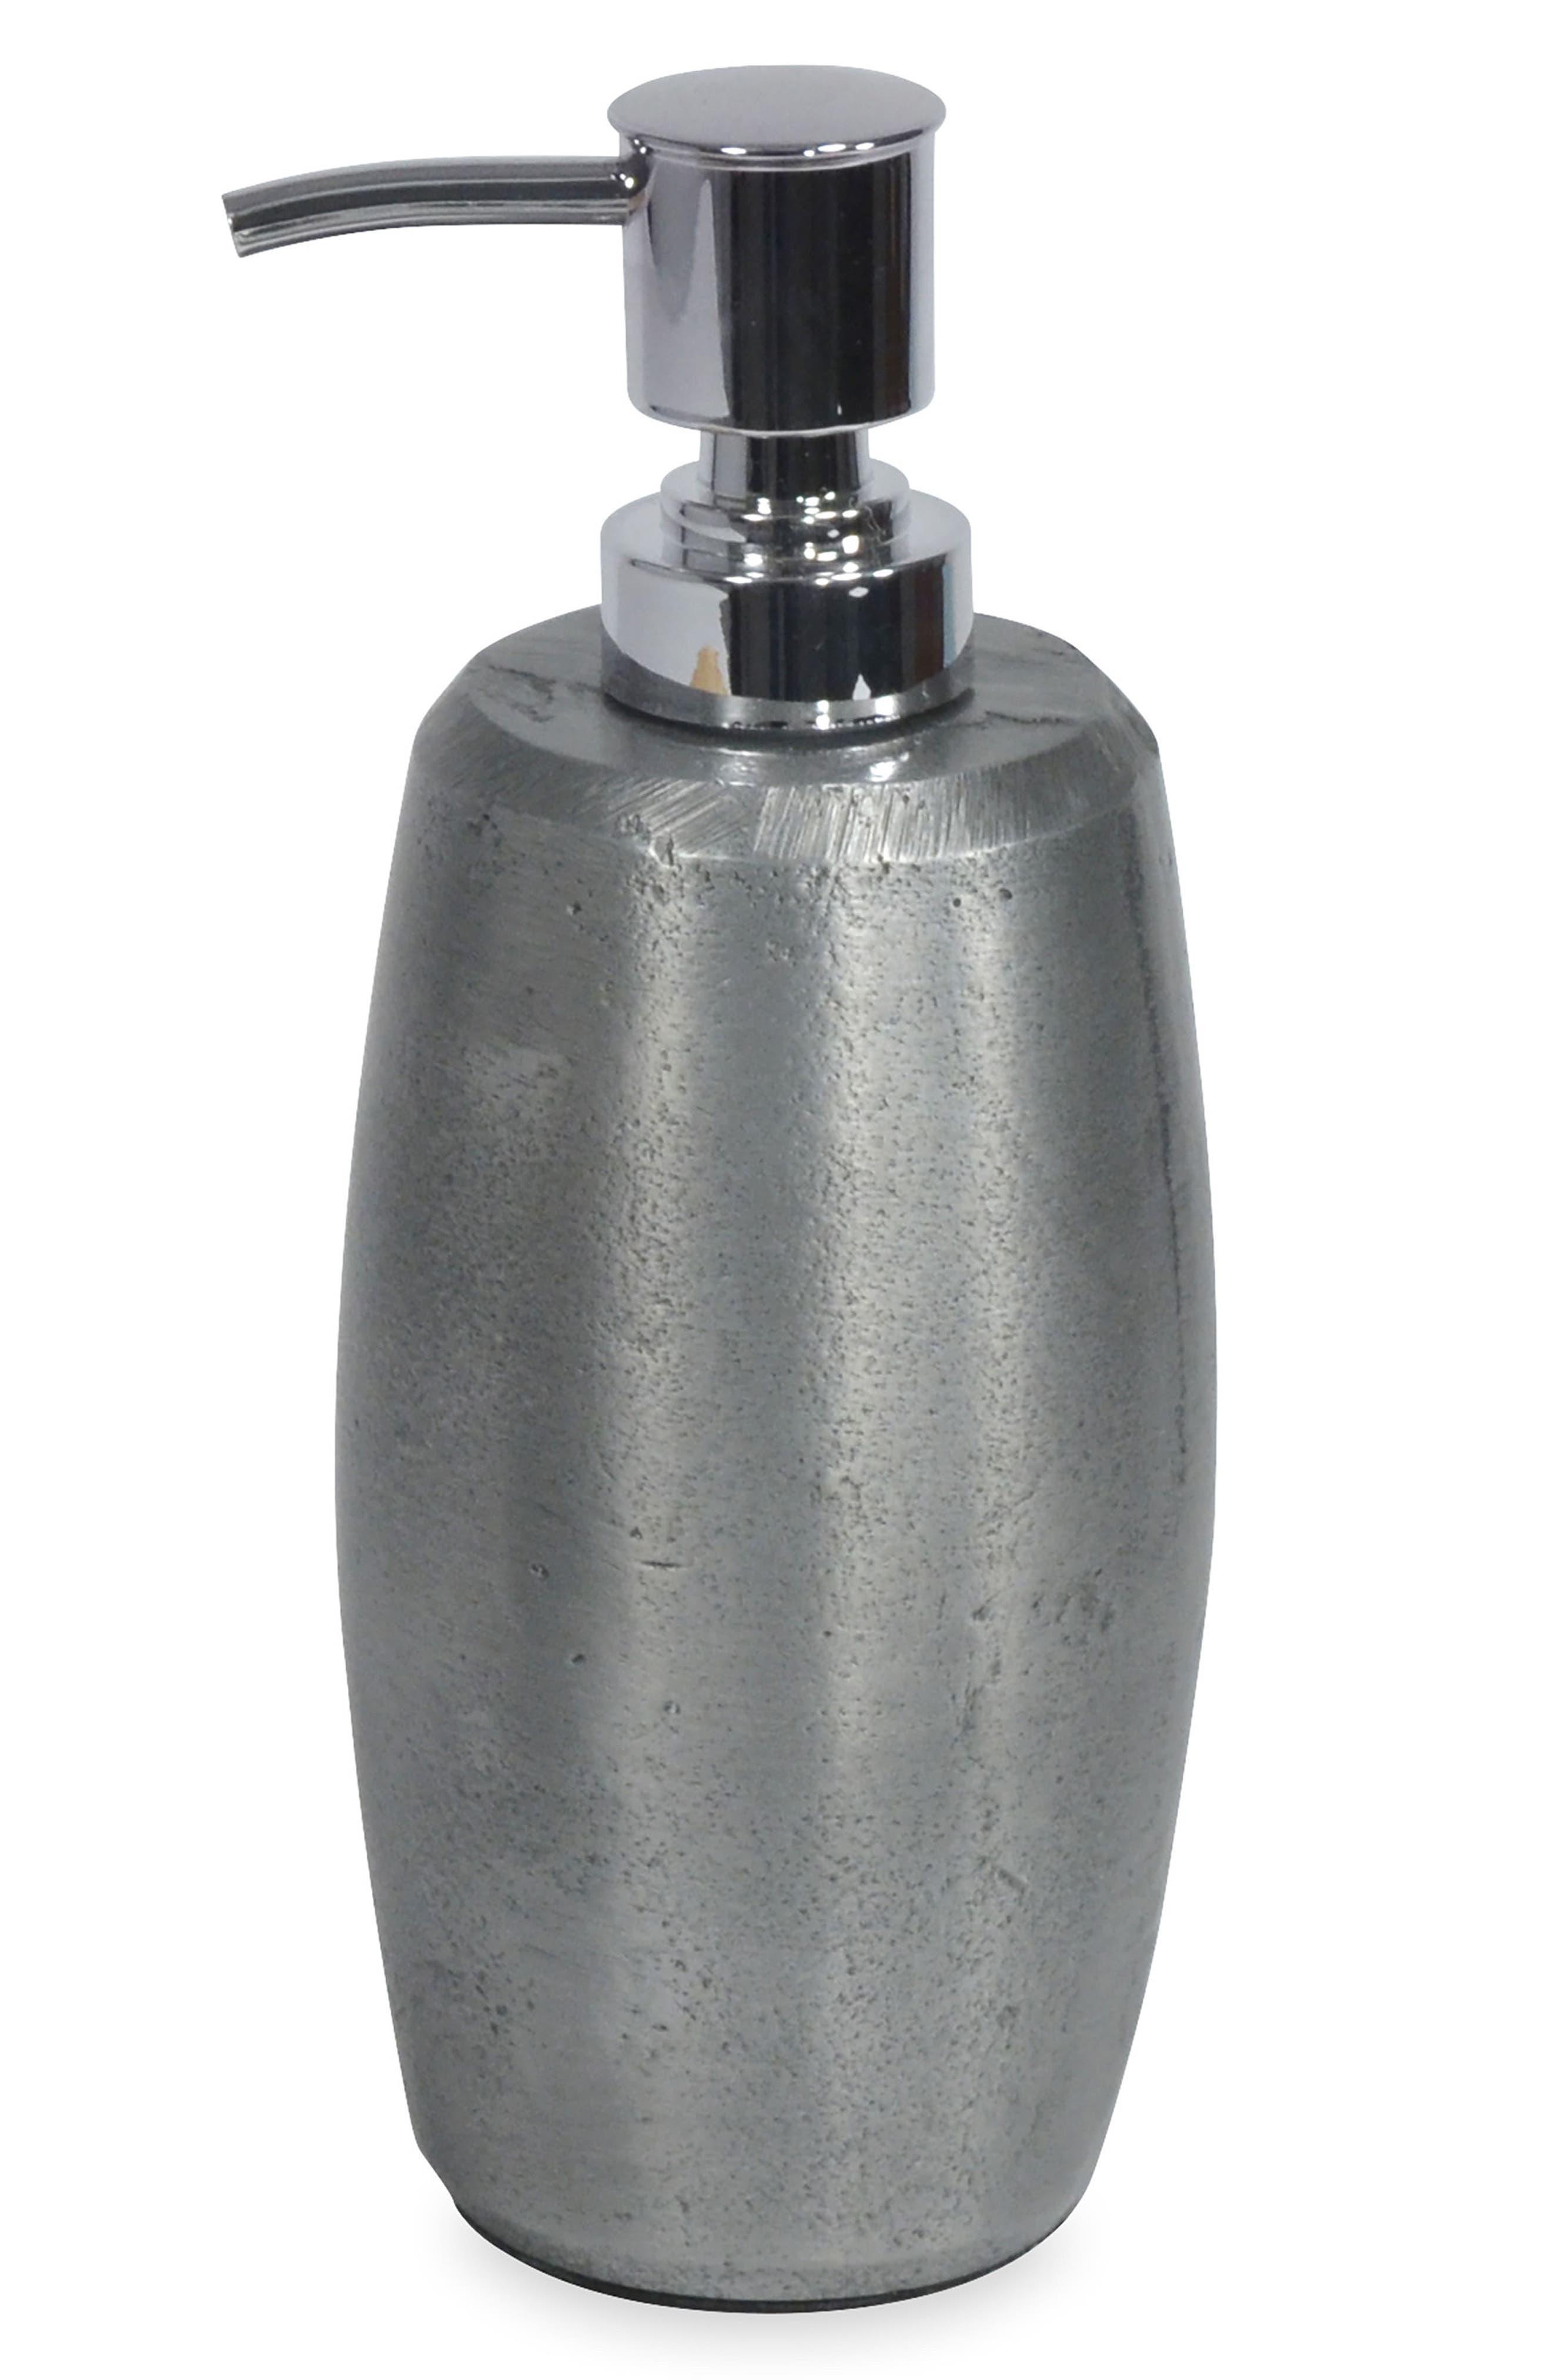 DKNY Pure Aluminum Lotion Pump